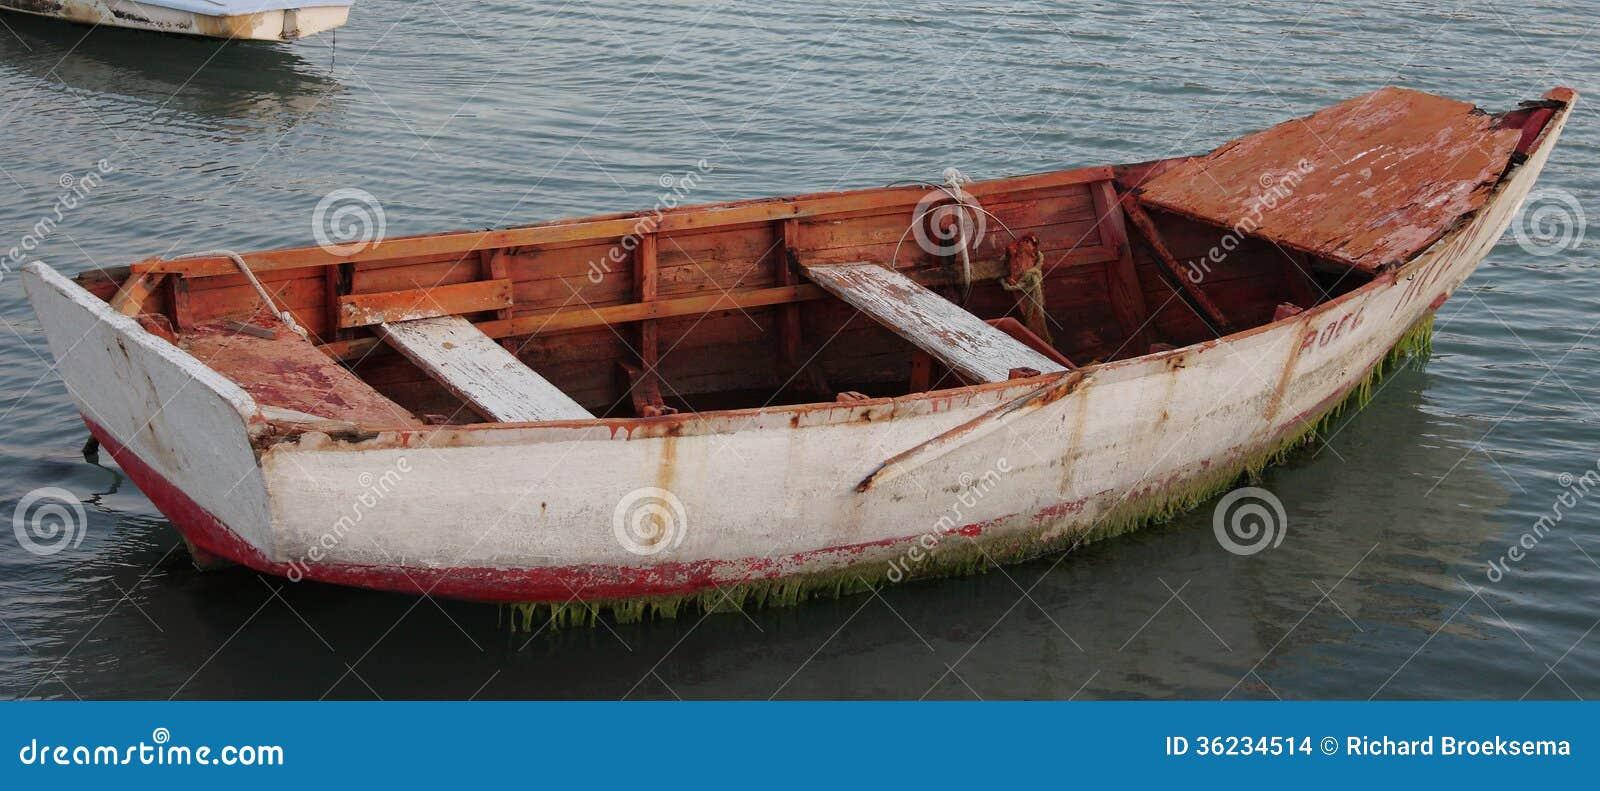 Wooden Fishing Boat Stock Photo Image Of Moss Fishing